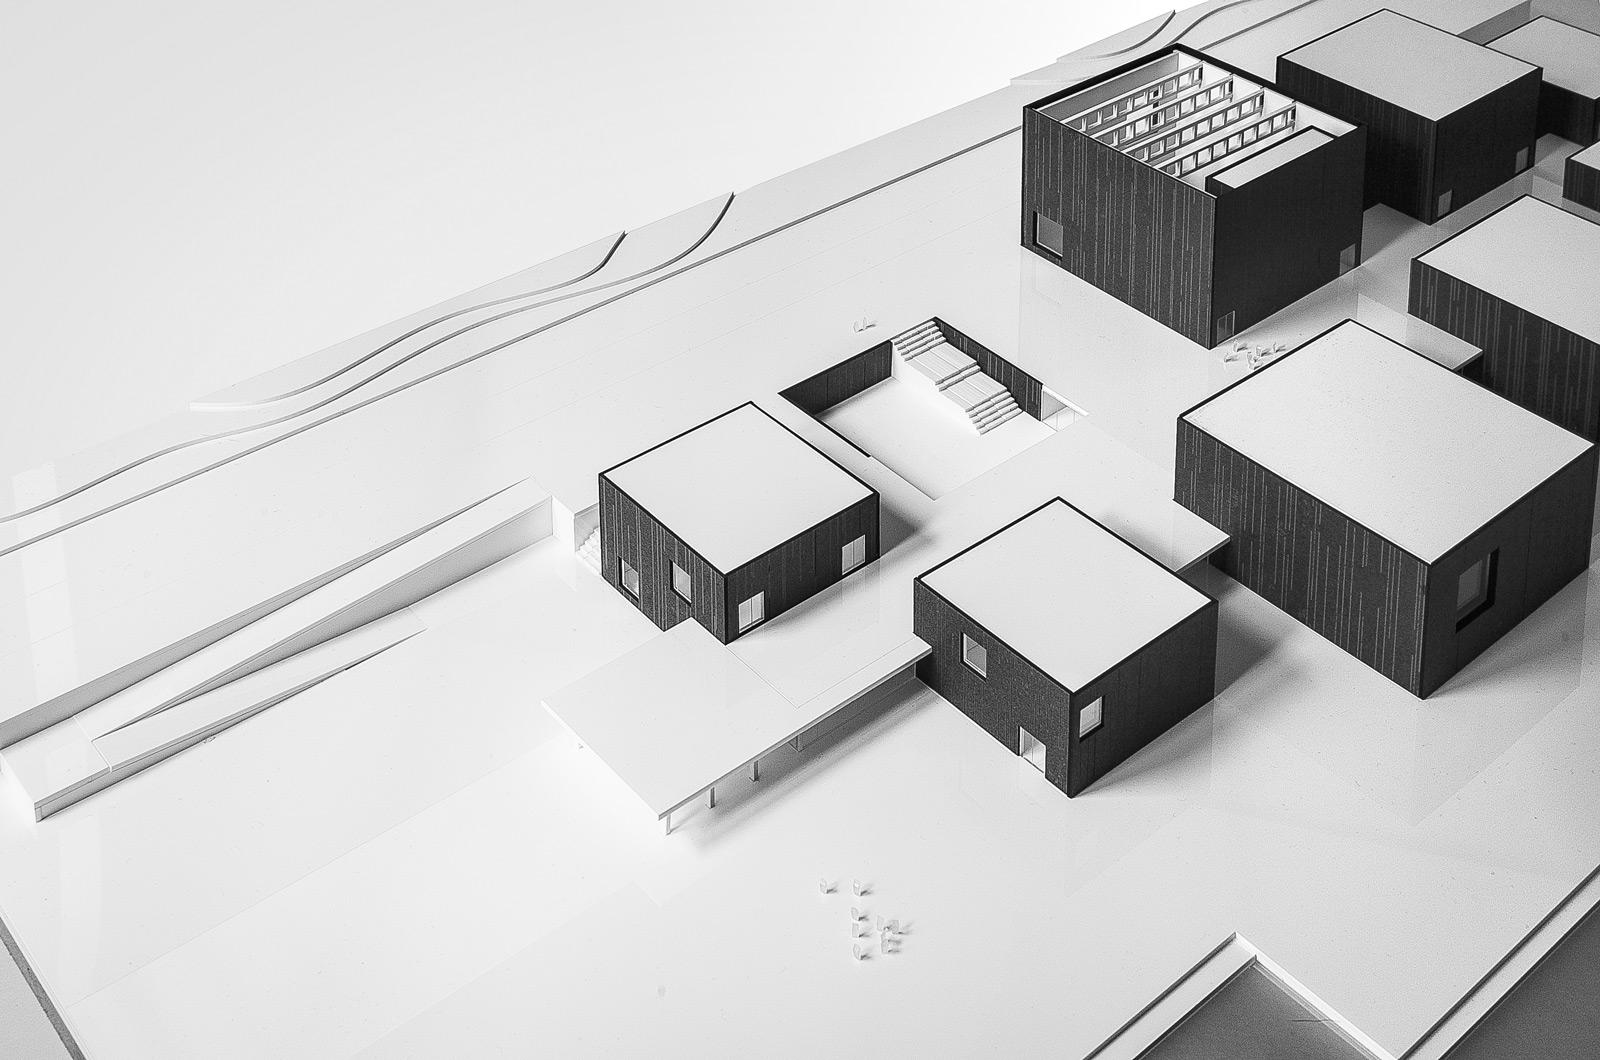 maqueta-arquitectura-valencia-arquiayuda-arquimaqueta-museo-fluvial-en-oporto-architecture-model (3)